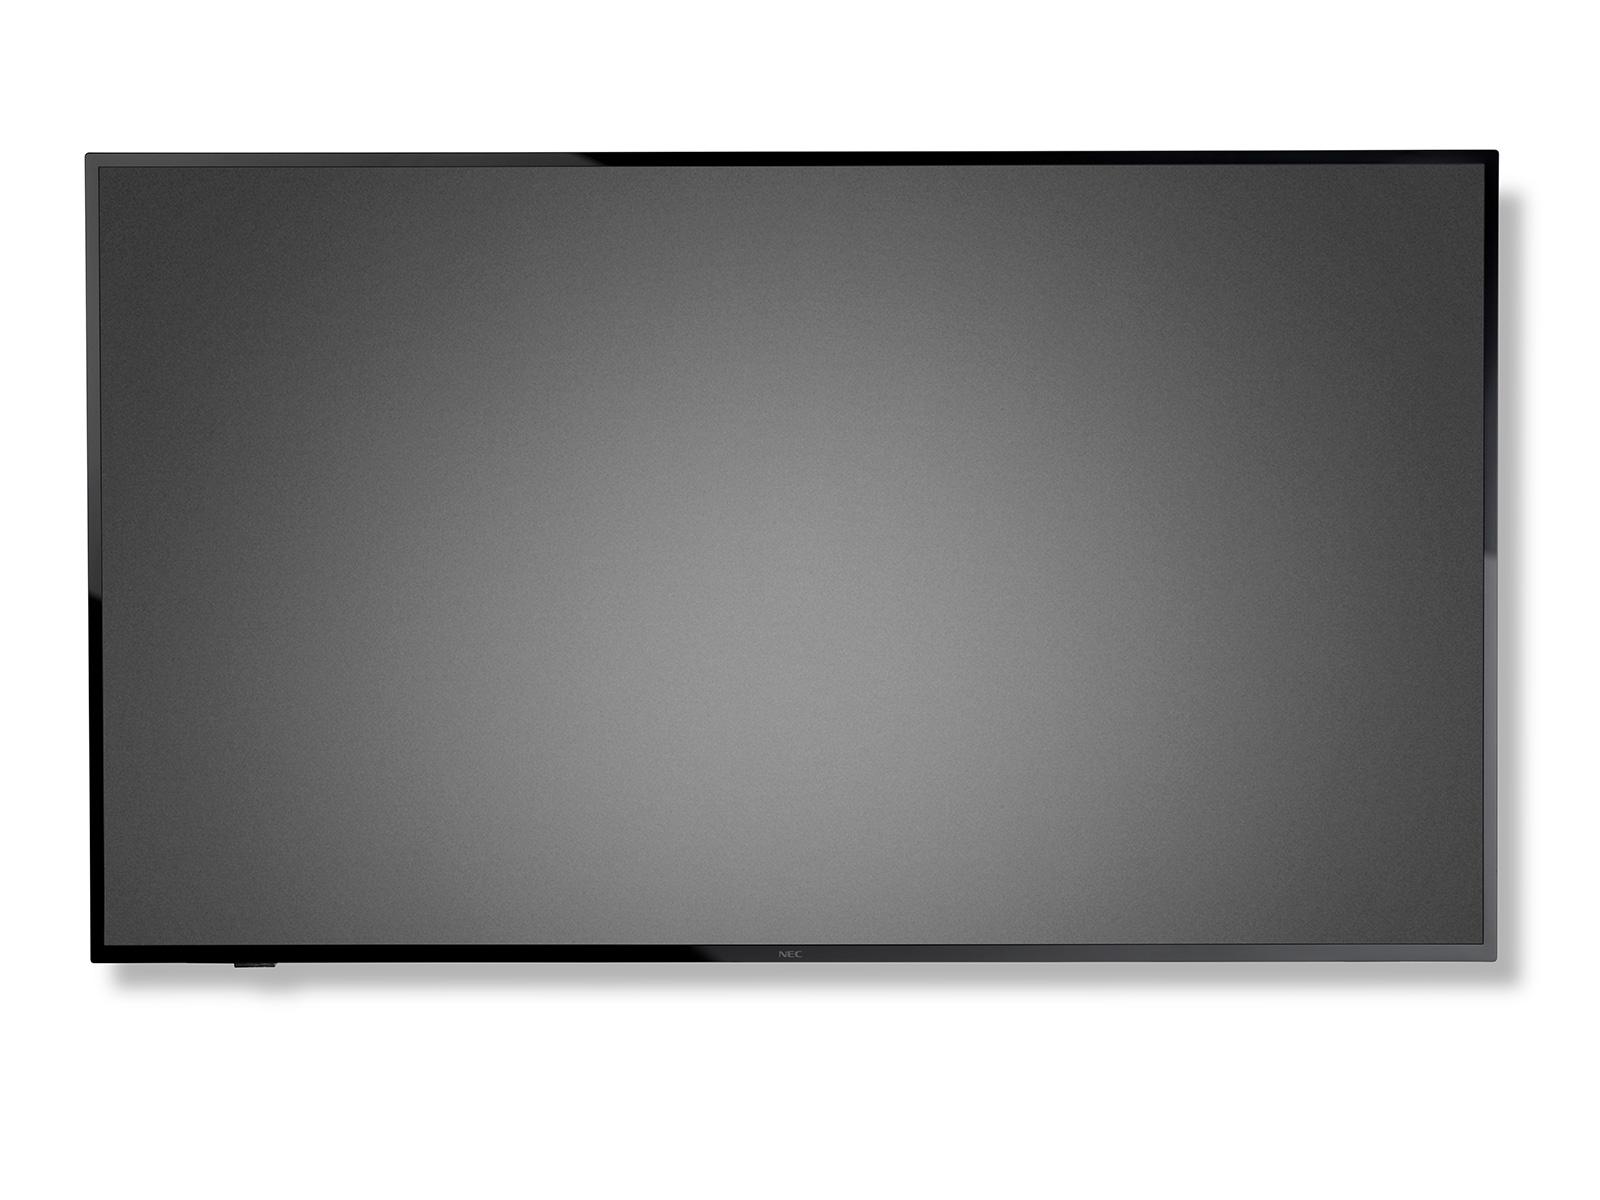 "NEC LFD 43"" MuSyE437Q VA LED podsvit,3840x2160,4000:1,350cd,8ms,VGA,3 x HDMI,SPDIF,RS-232C audio 2x5W,16/7, bez stojana"